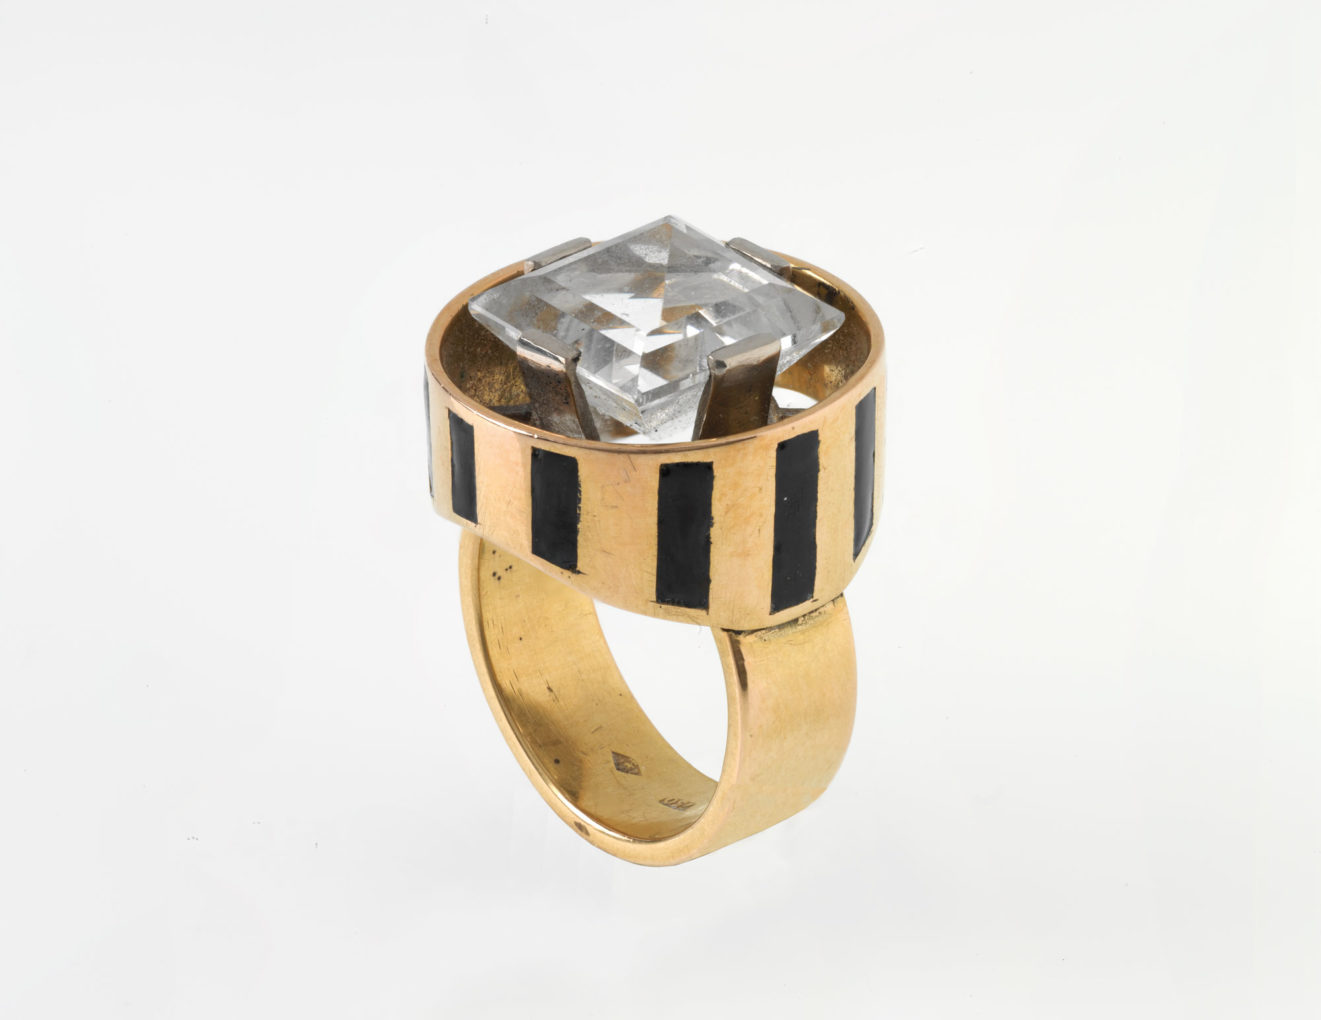 5-17_Jewellery_Landesmuseum_Apotheker-Riggenbach_05-9---SZH-0056_DIG-37998_LM-82577